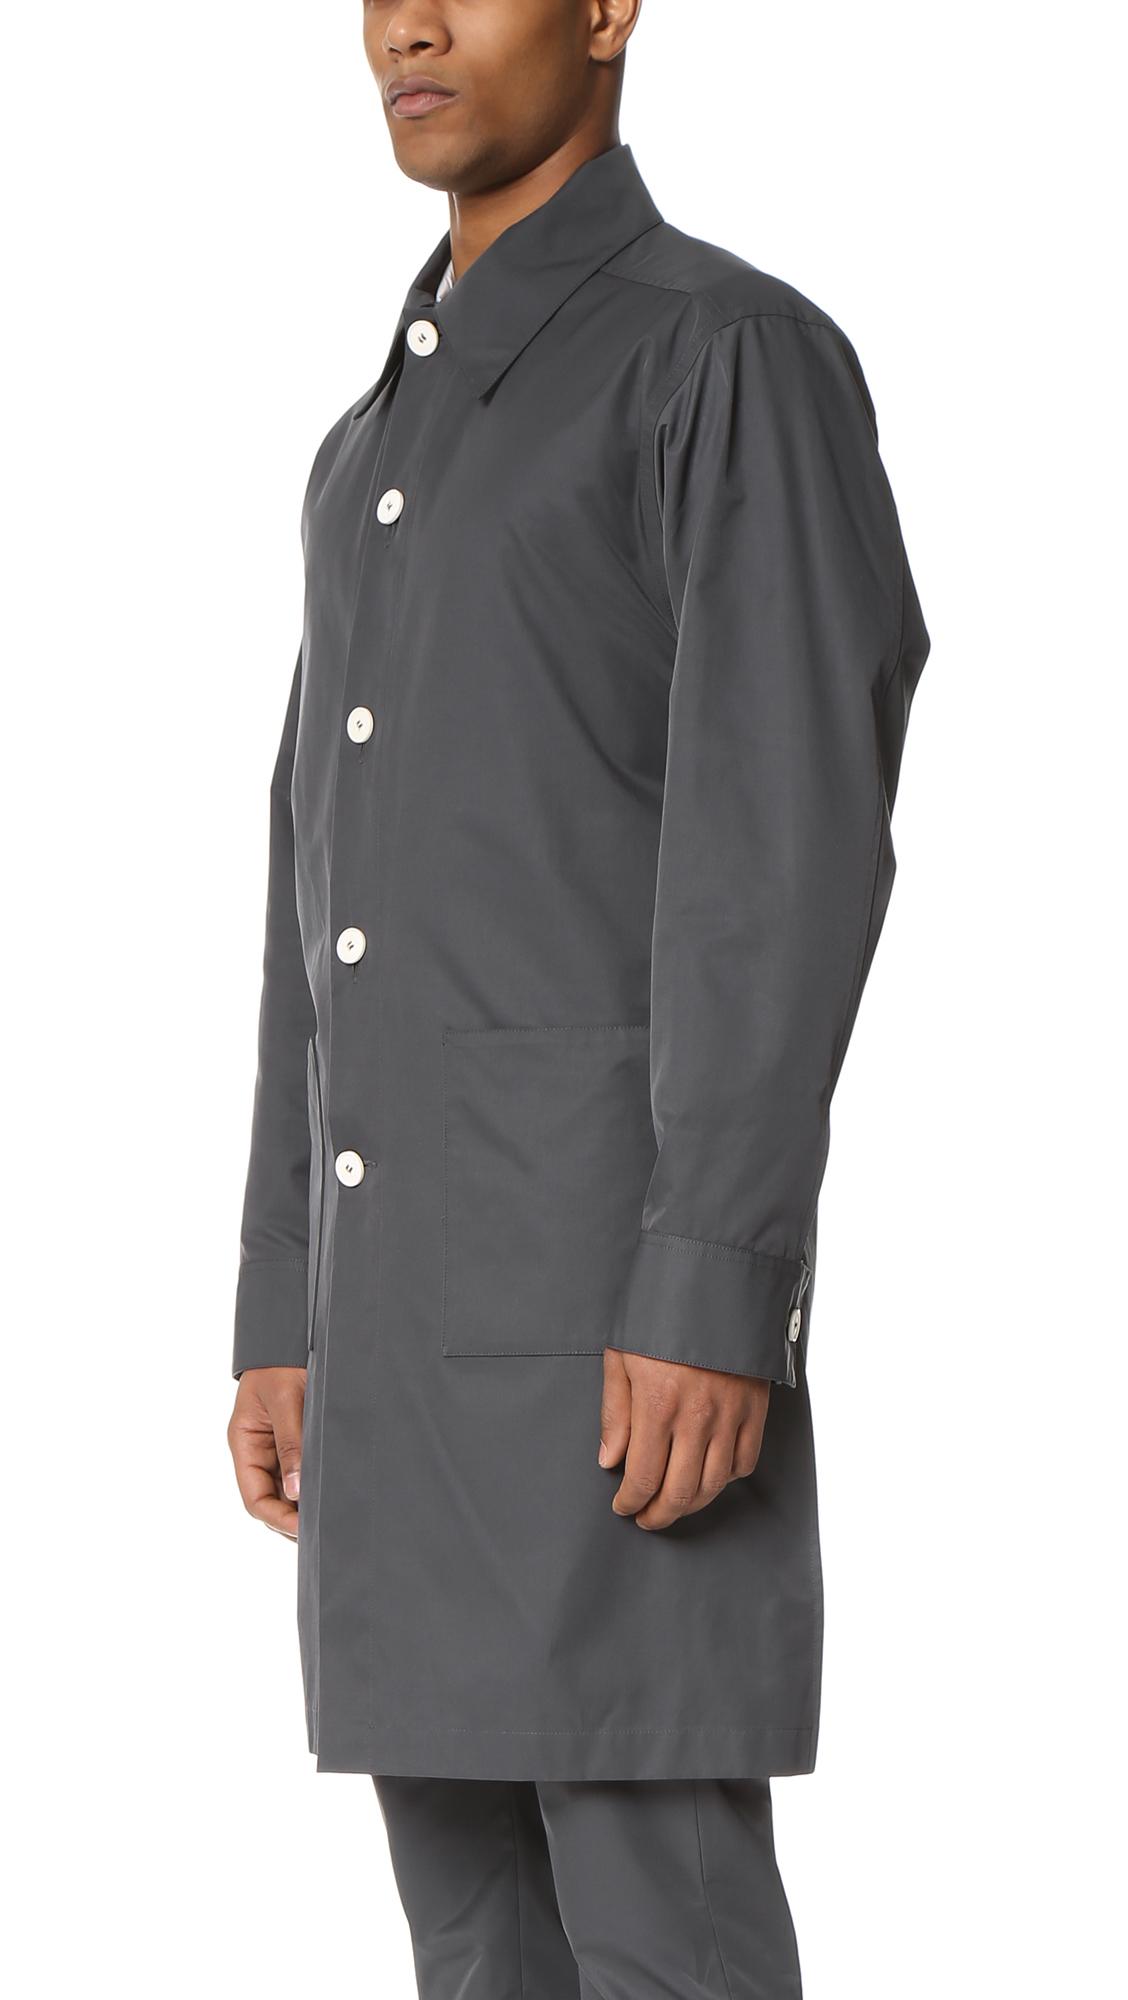 Marni Technical Poplin Lab Coat In Gray For Men Lyst